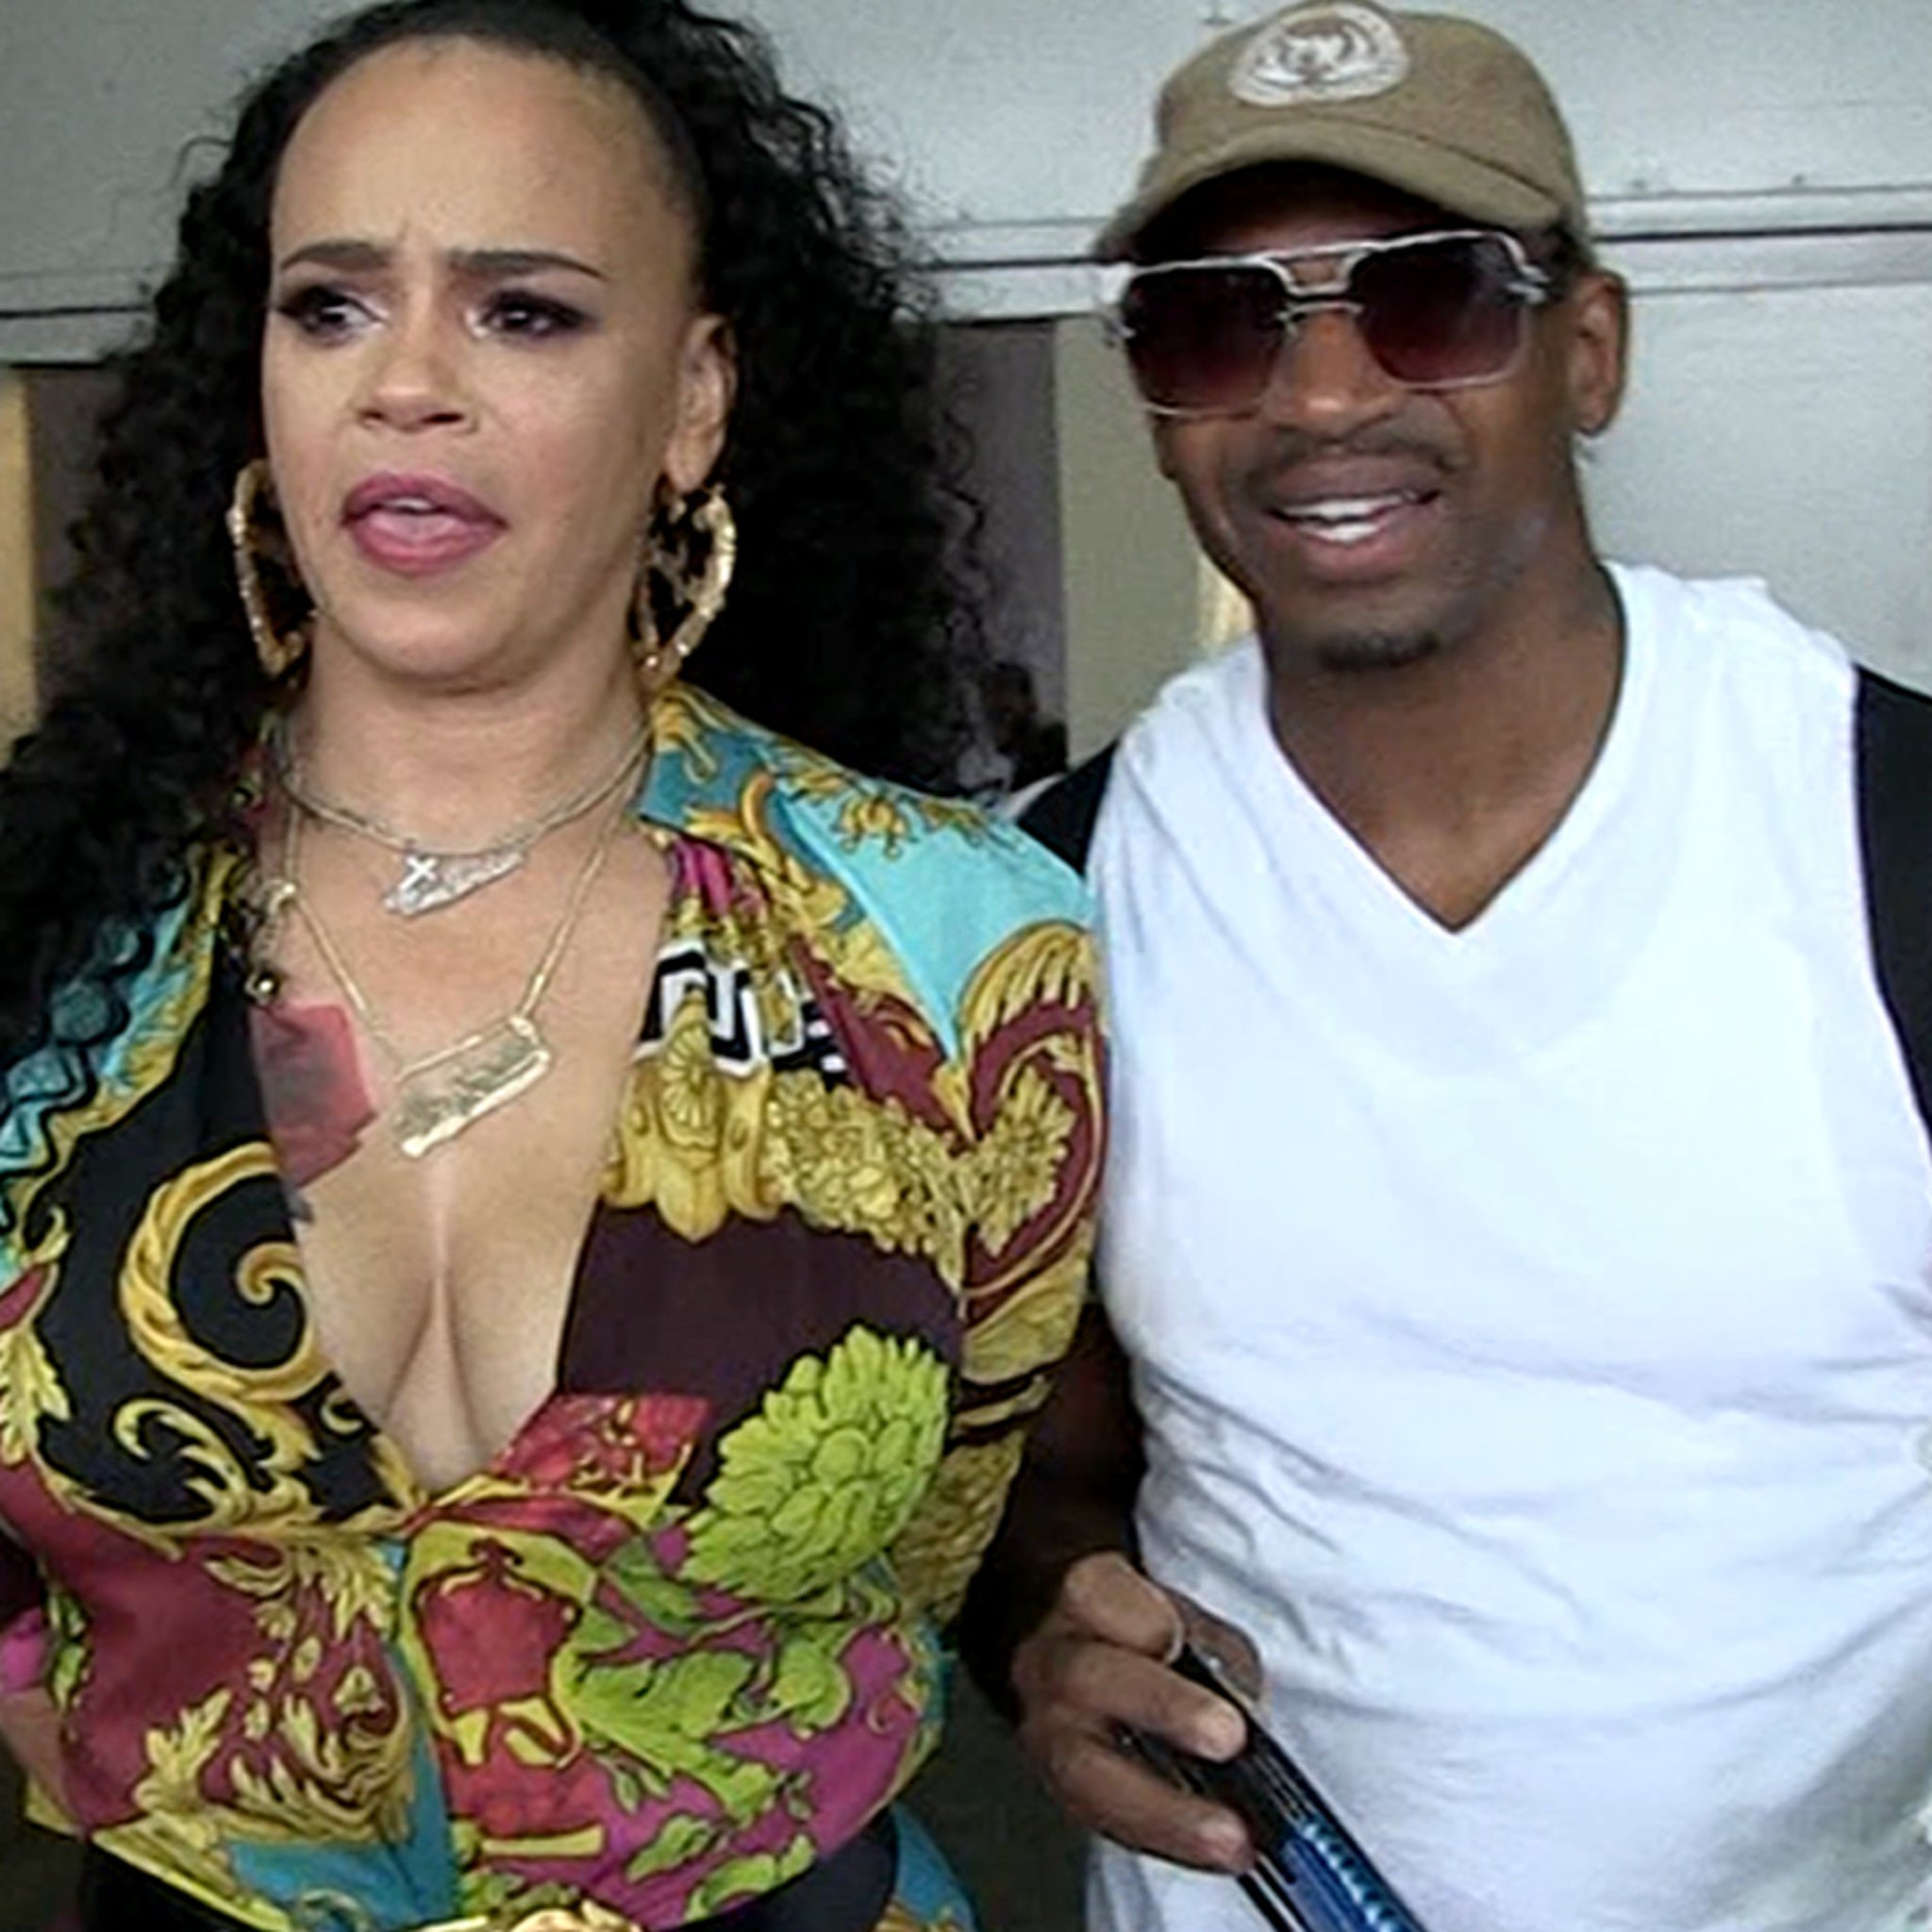 Faith Evans and Stevie J Downplay Marriage Trouble Rumors